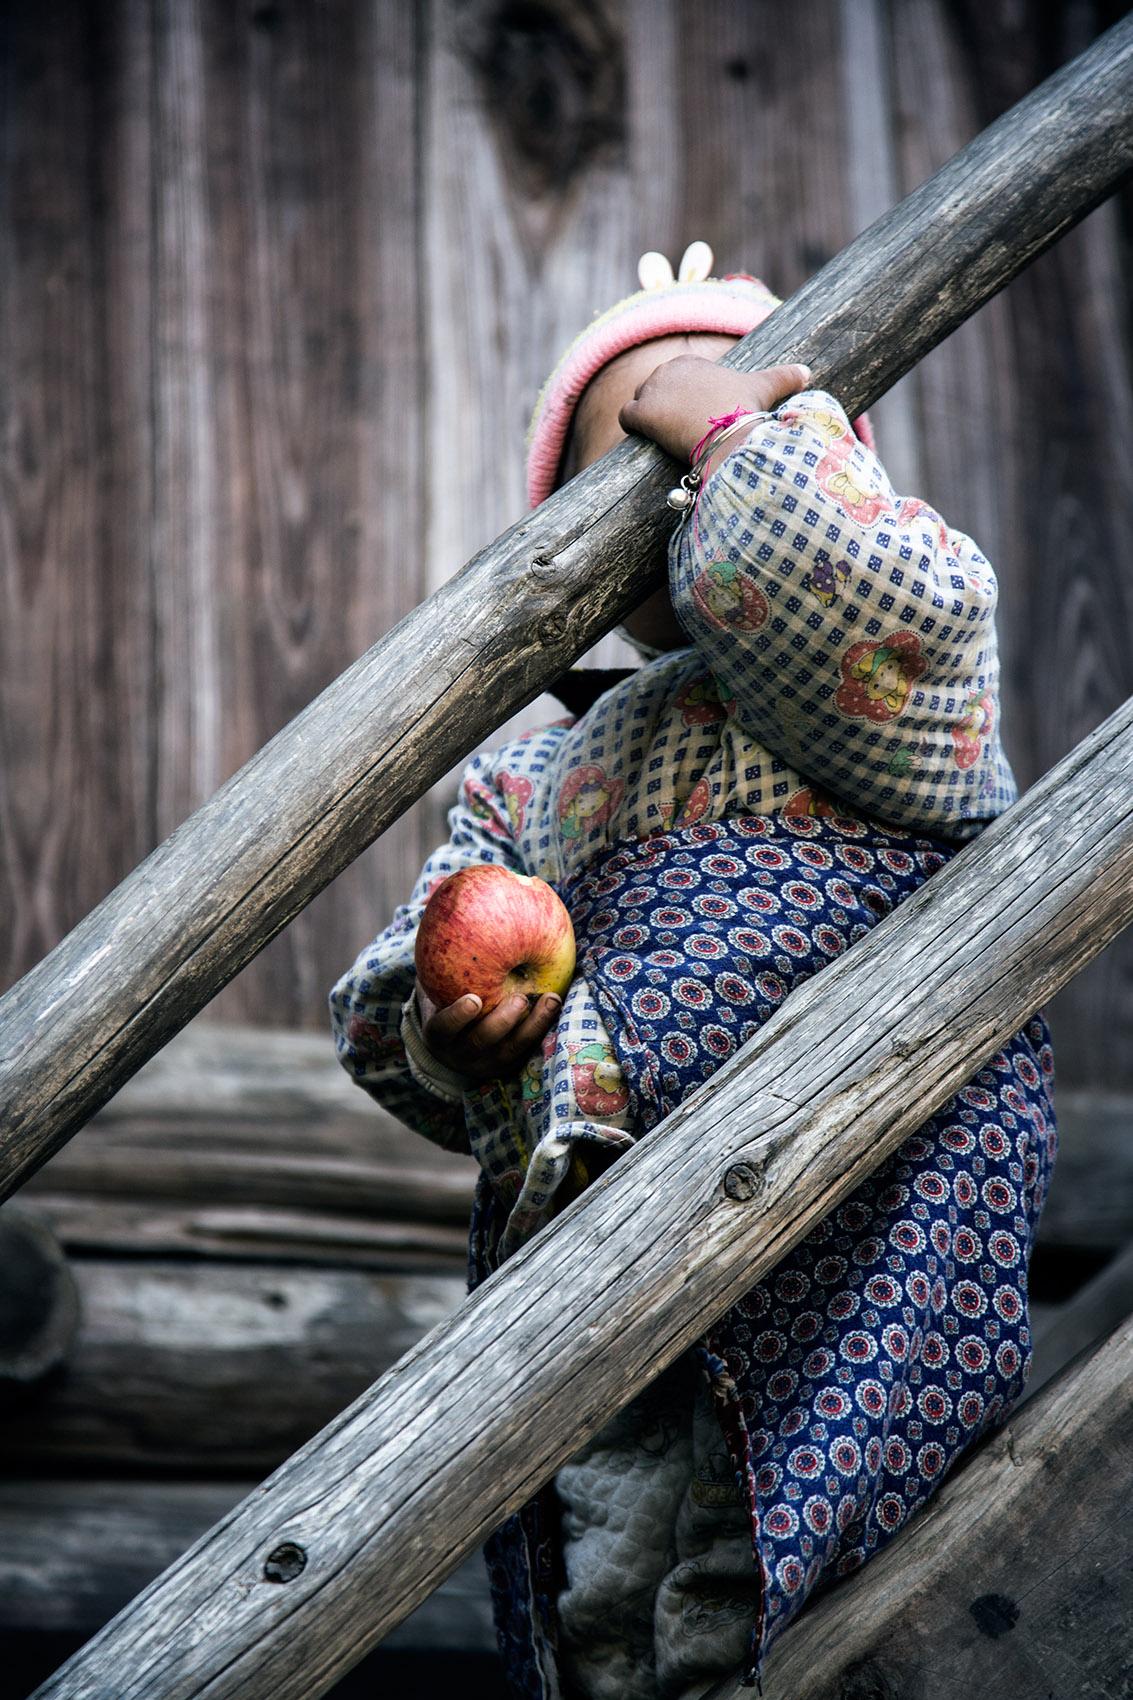 Apple 3 Nov 2016 - LB8.jpg